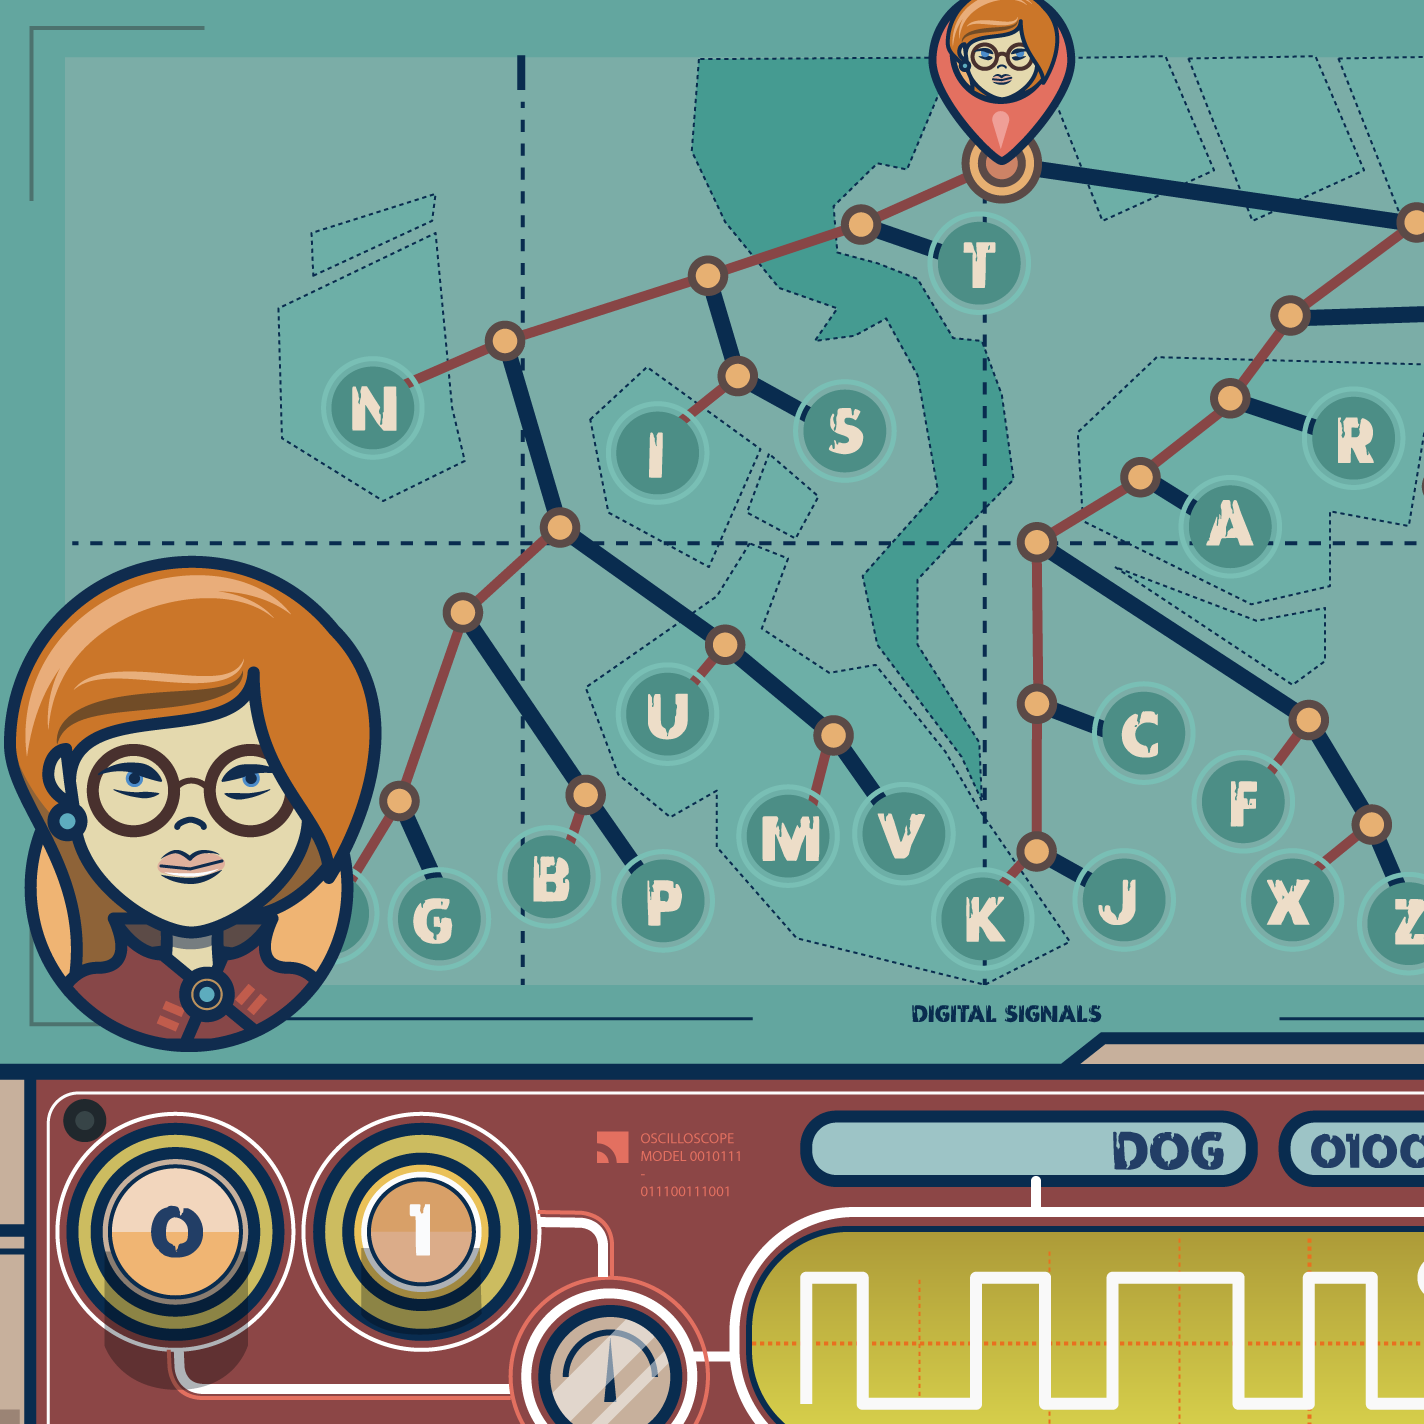 Legends of Learning: Digital Signals